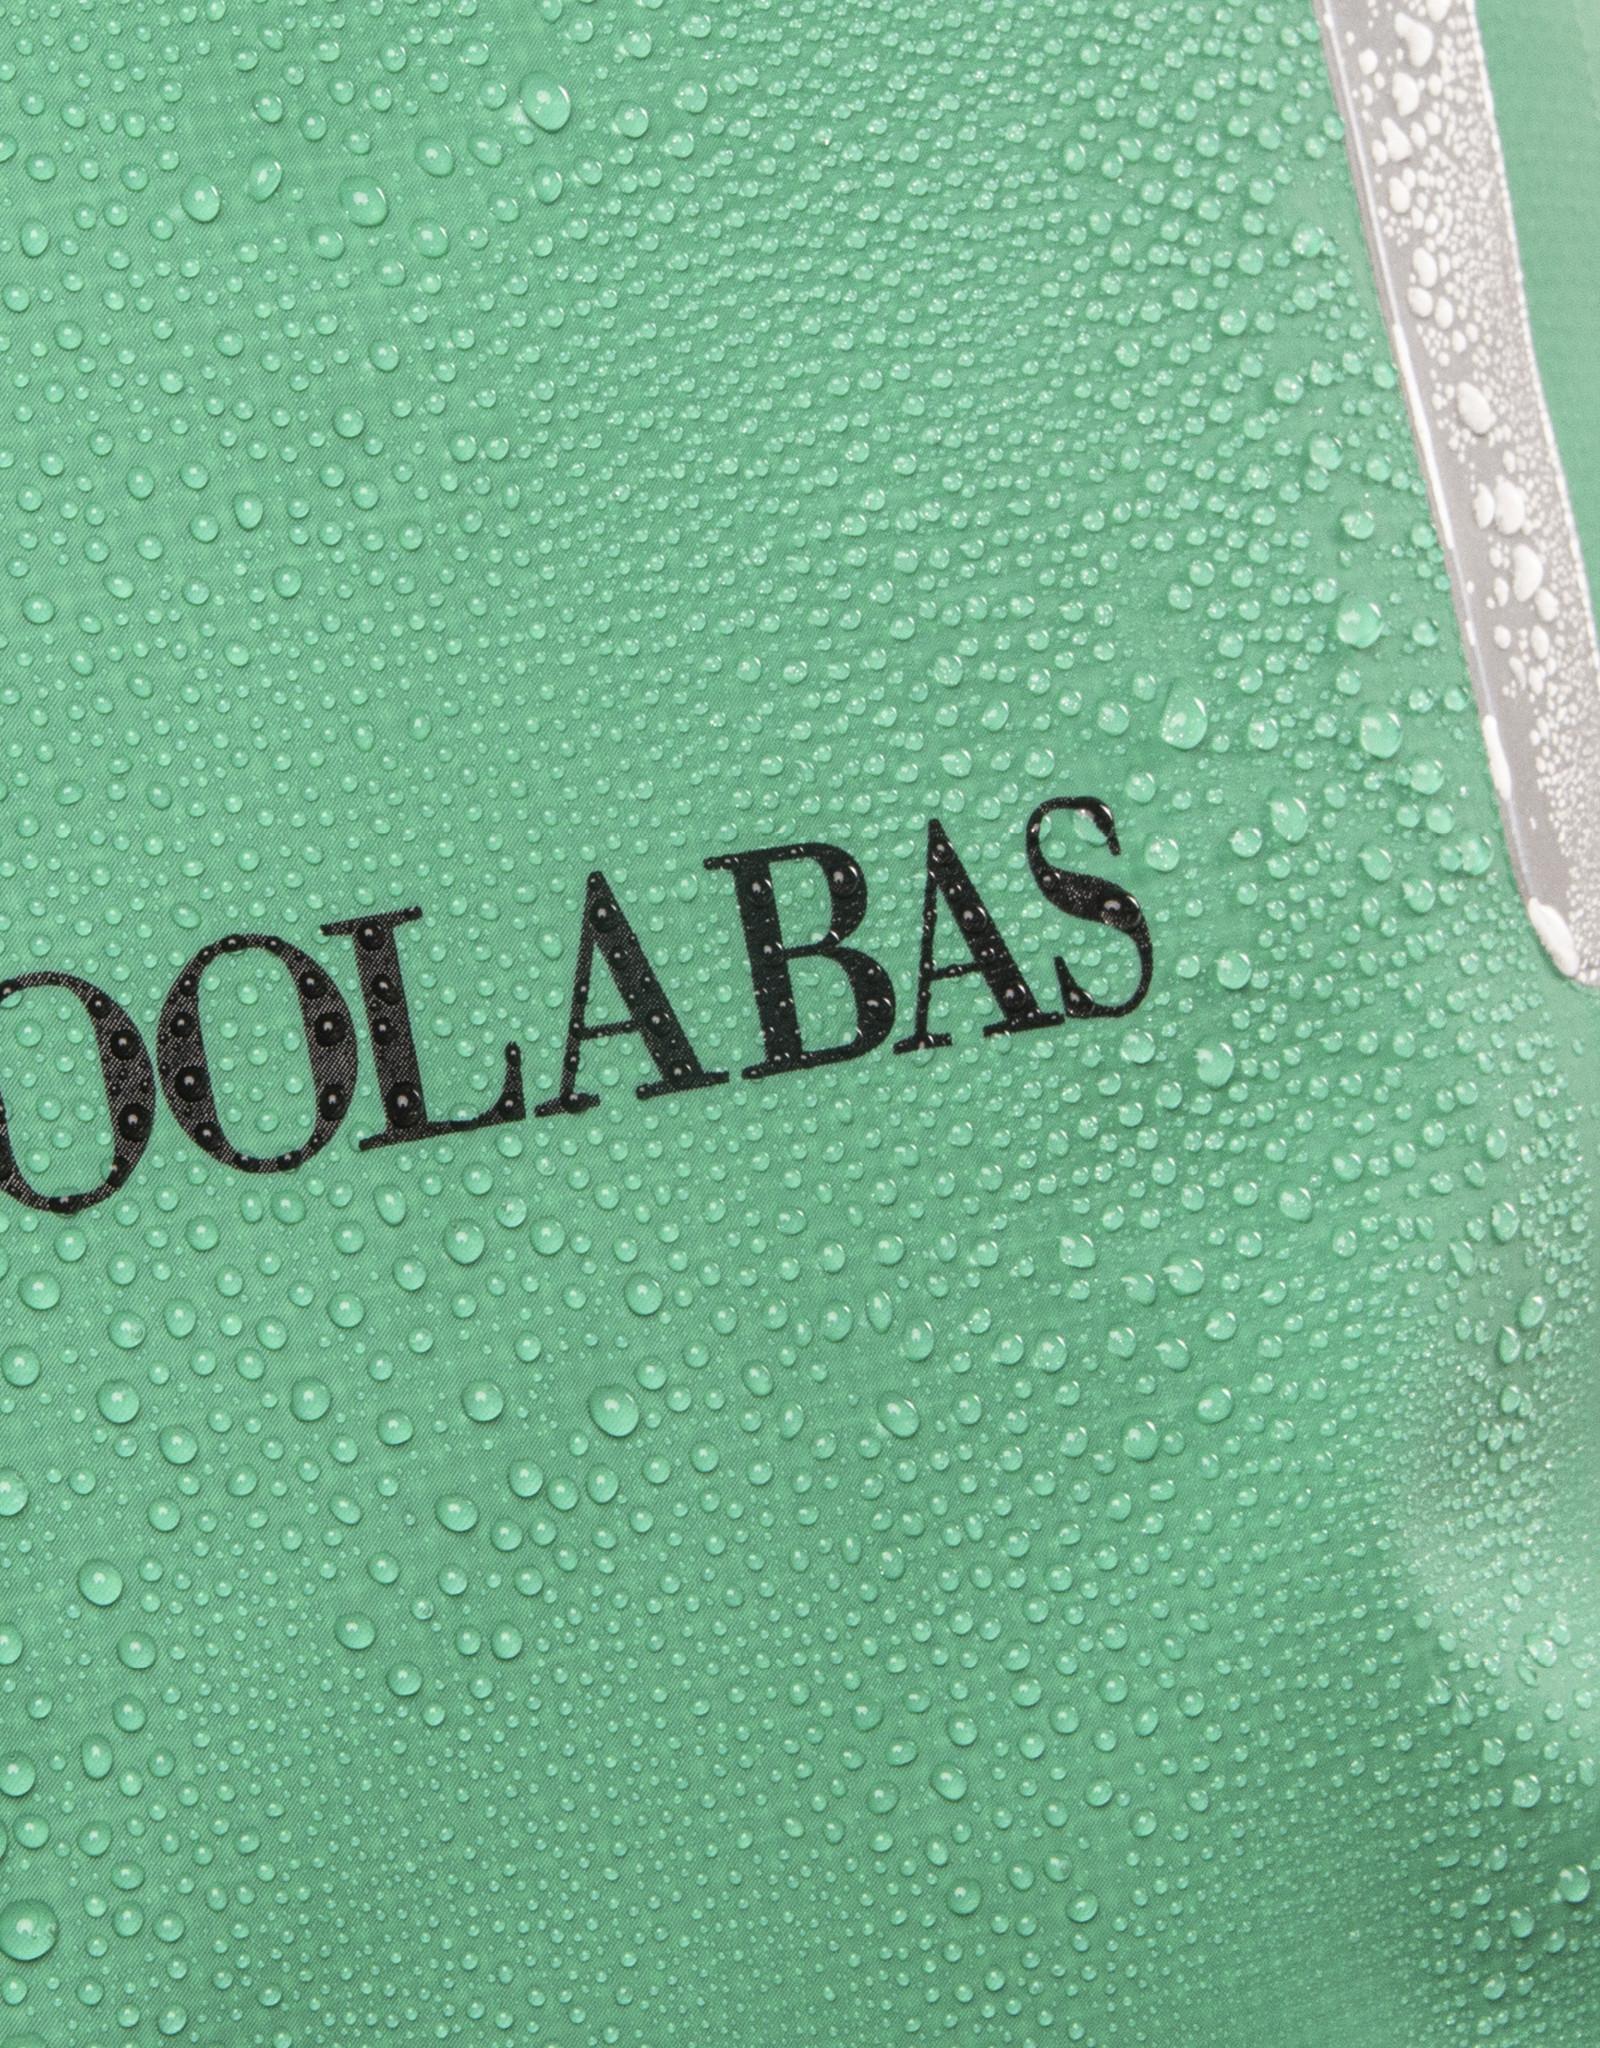 MOOLOOLABAS NOOSA MessengerBag